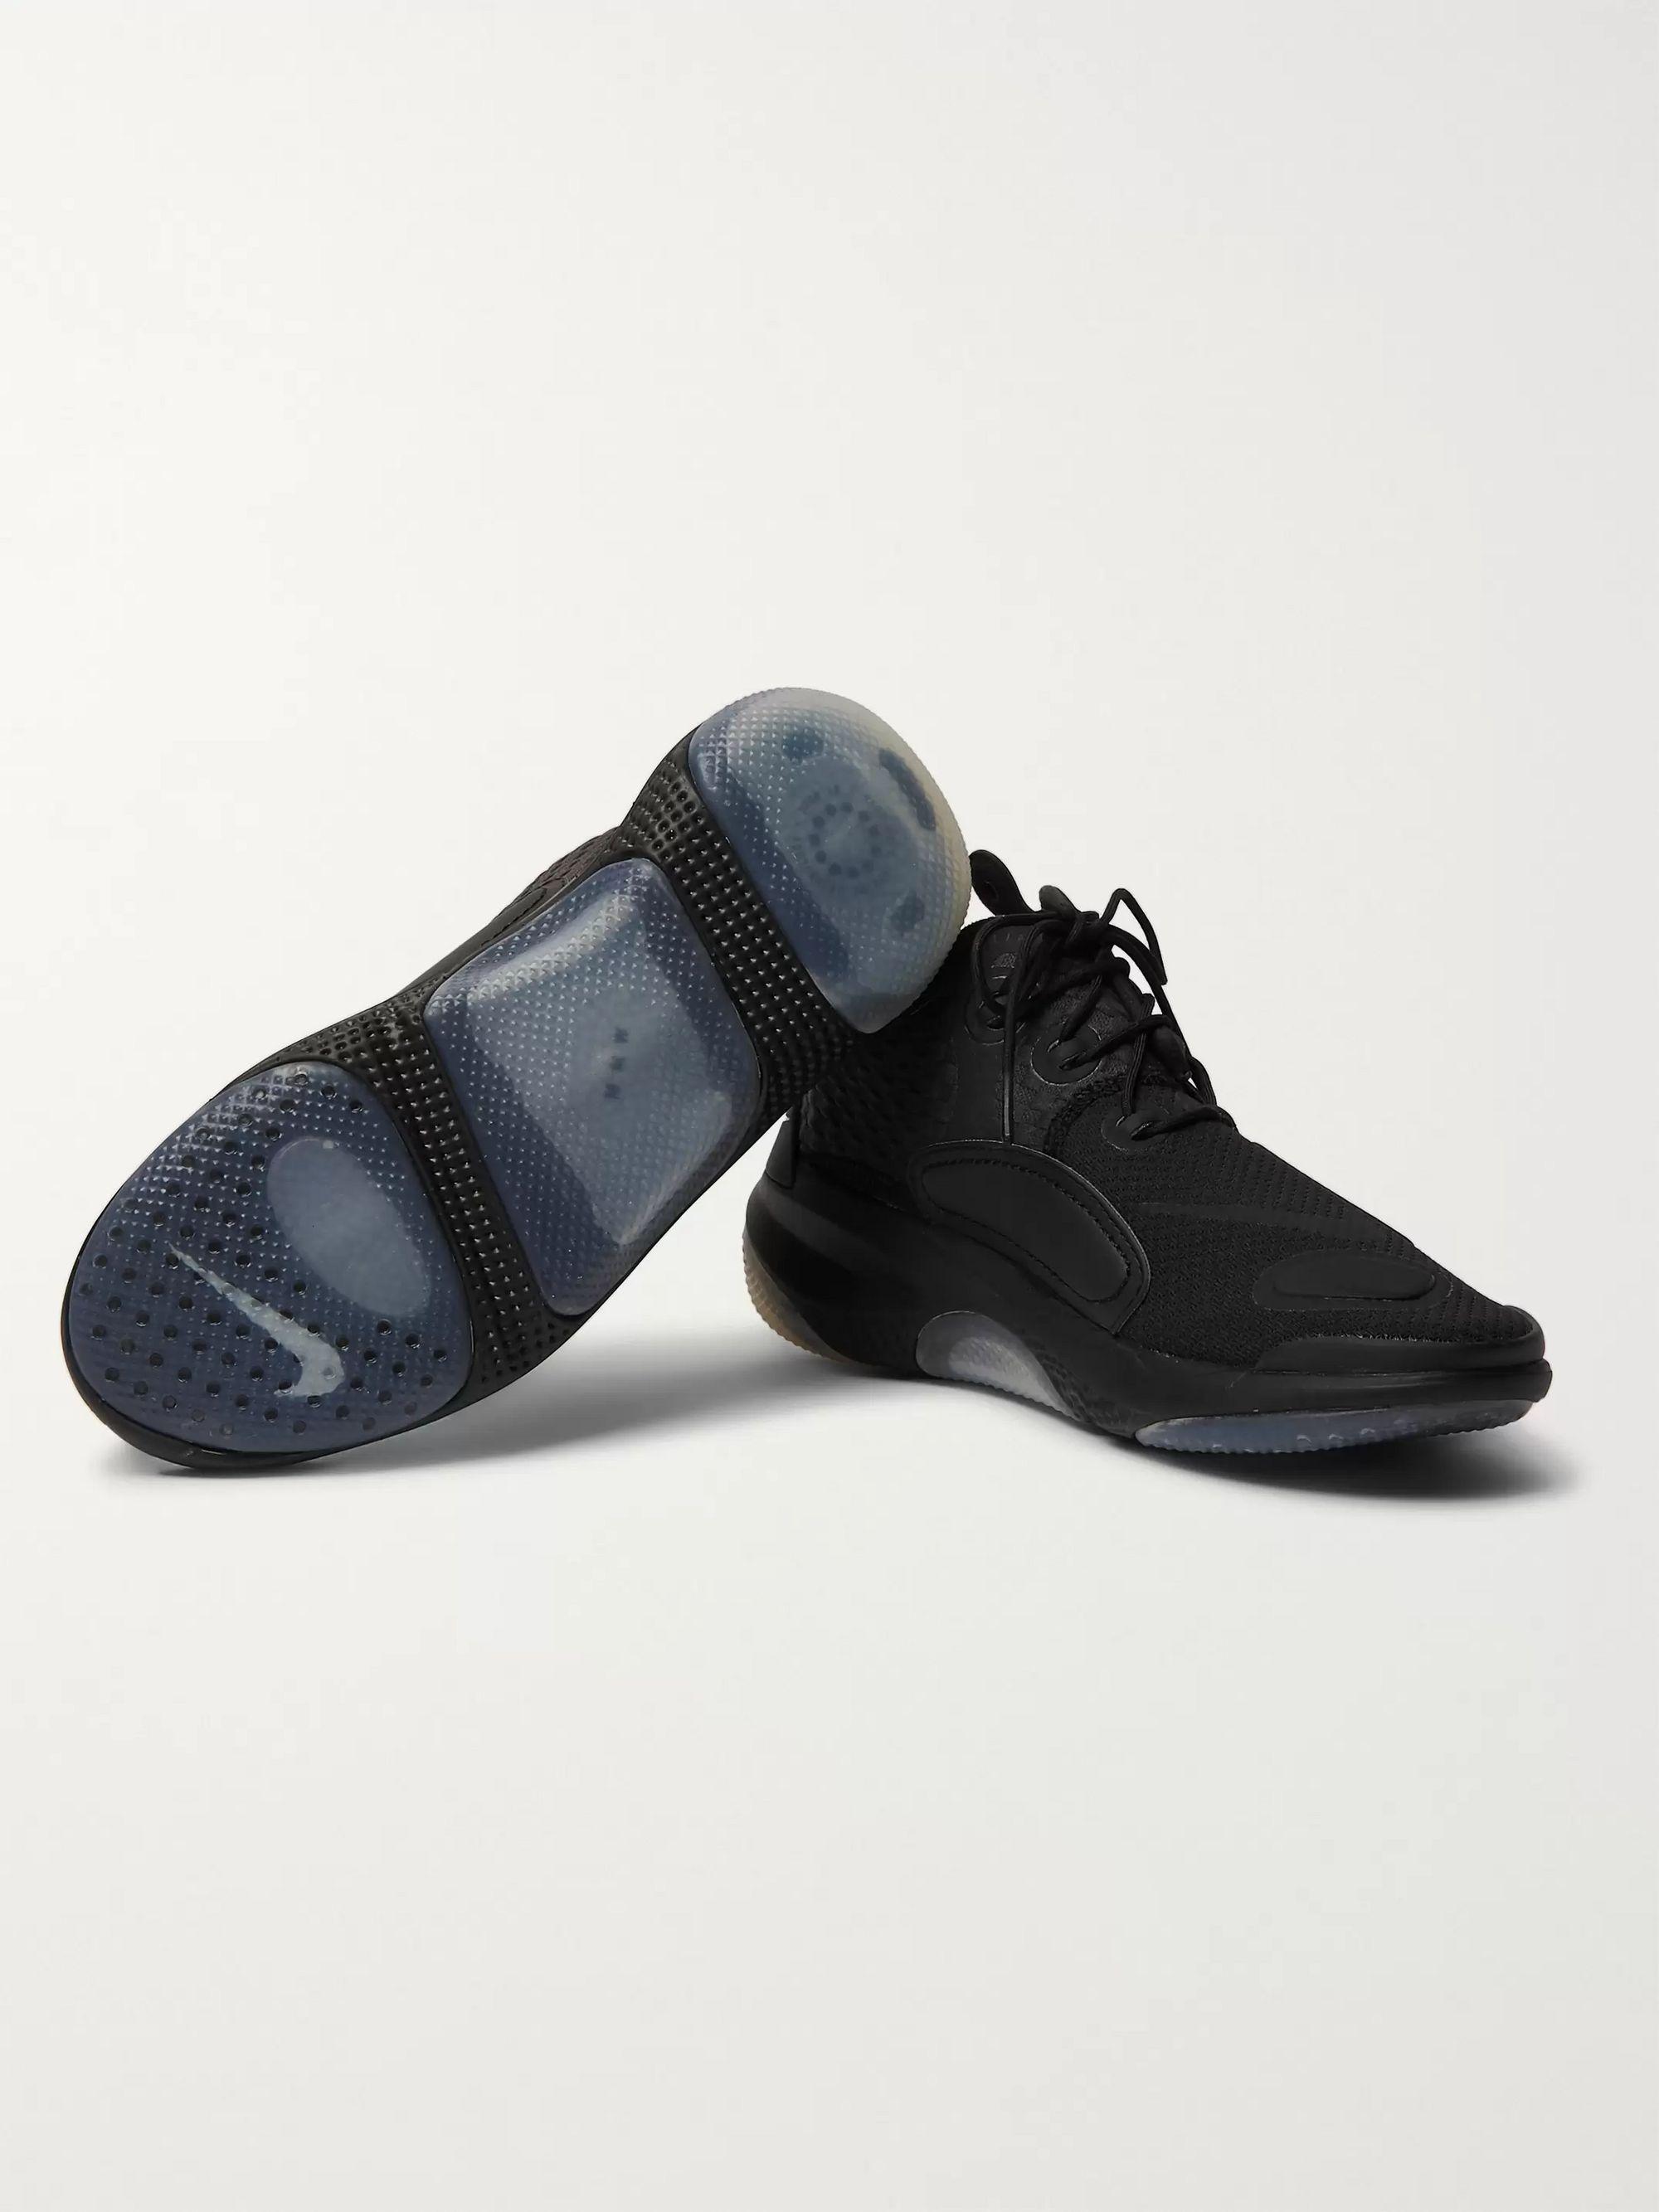 + Matthew M Williams Joyride CC3 Setter Mesh Sneakers